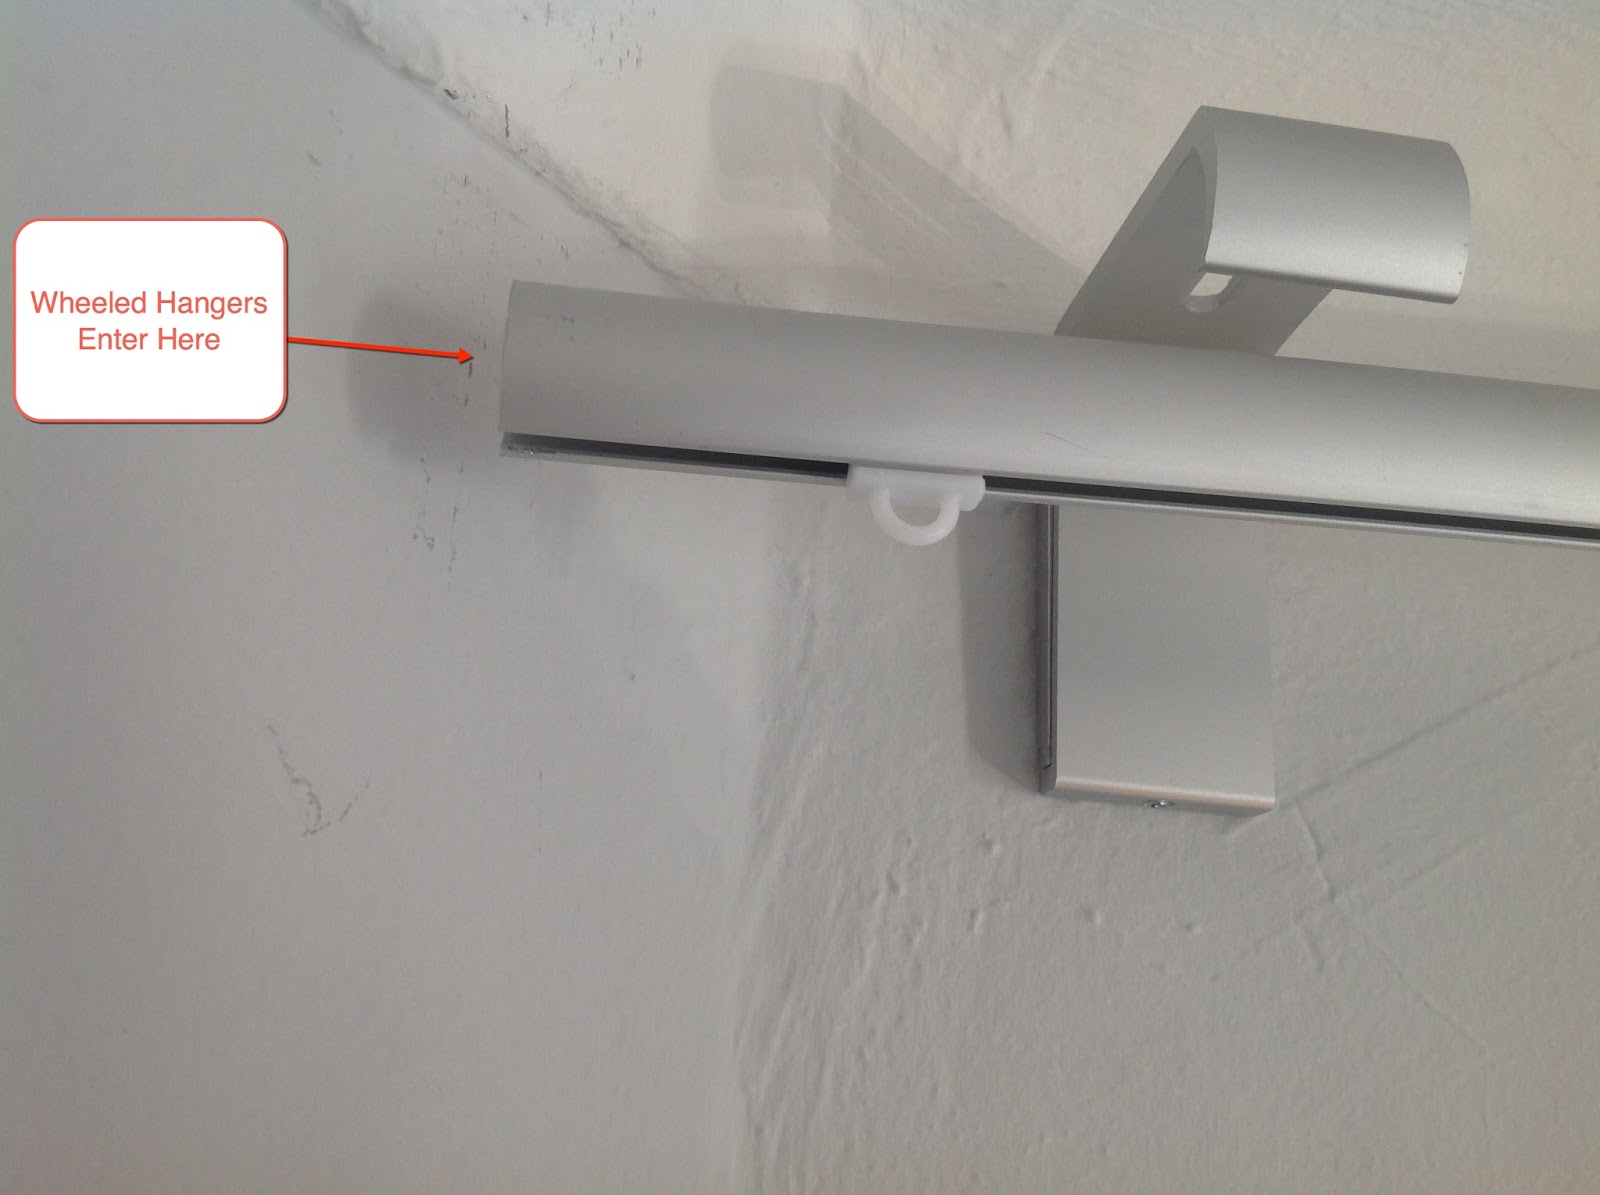 Floor to ceiling curtains on ikea kvartal curtain rail system build a - Troubleshooting Ikea Kvartal Curtain Rods Install